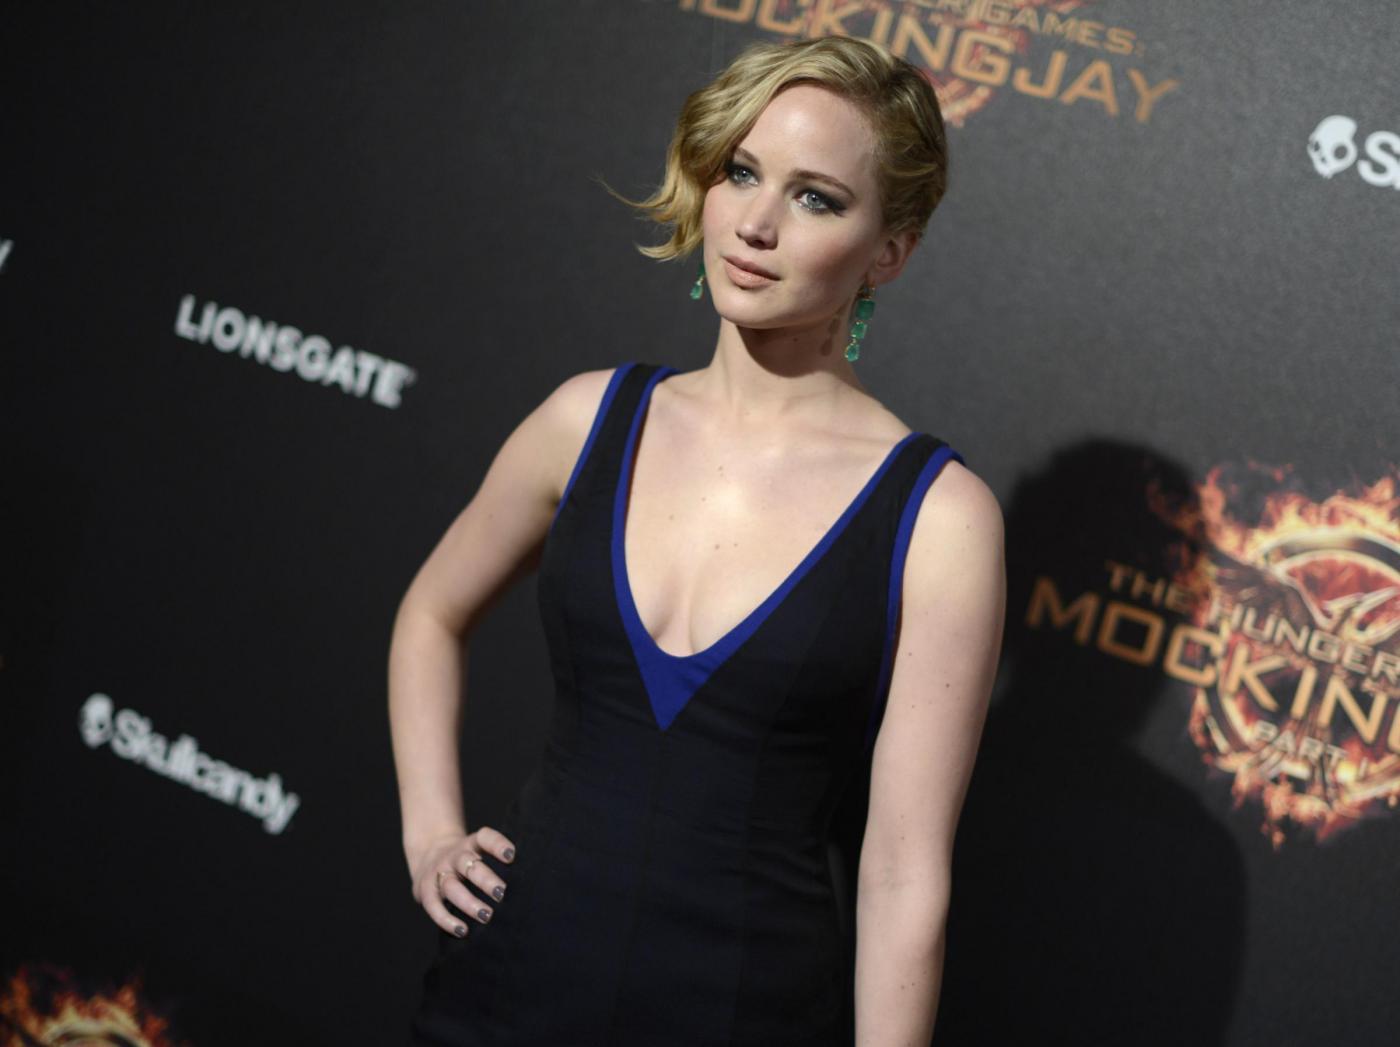 Jennifer Lawrence e Chris Martin: appuntamento segreto a Los Angeles